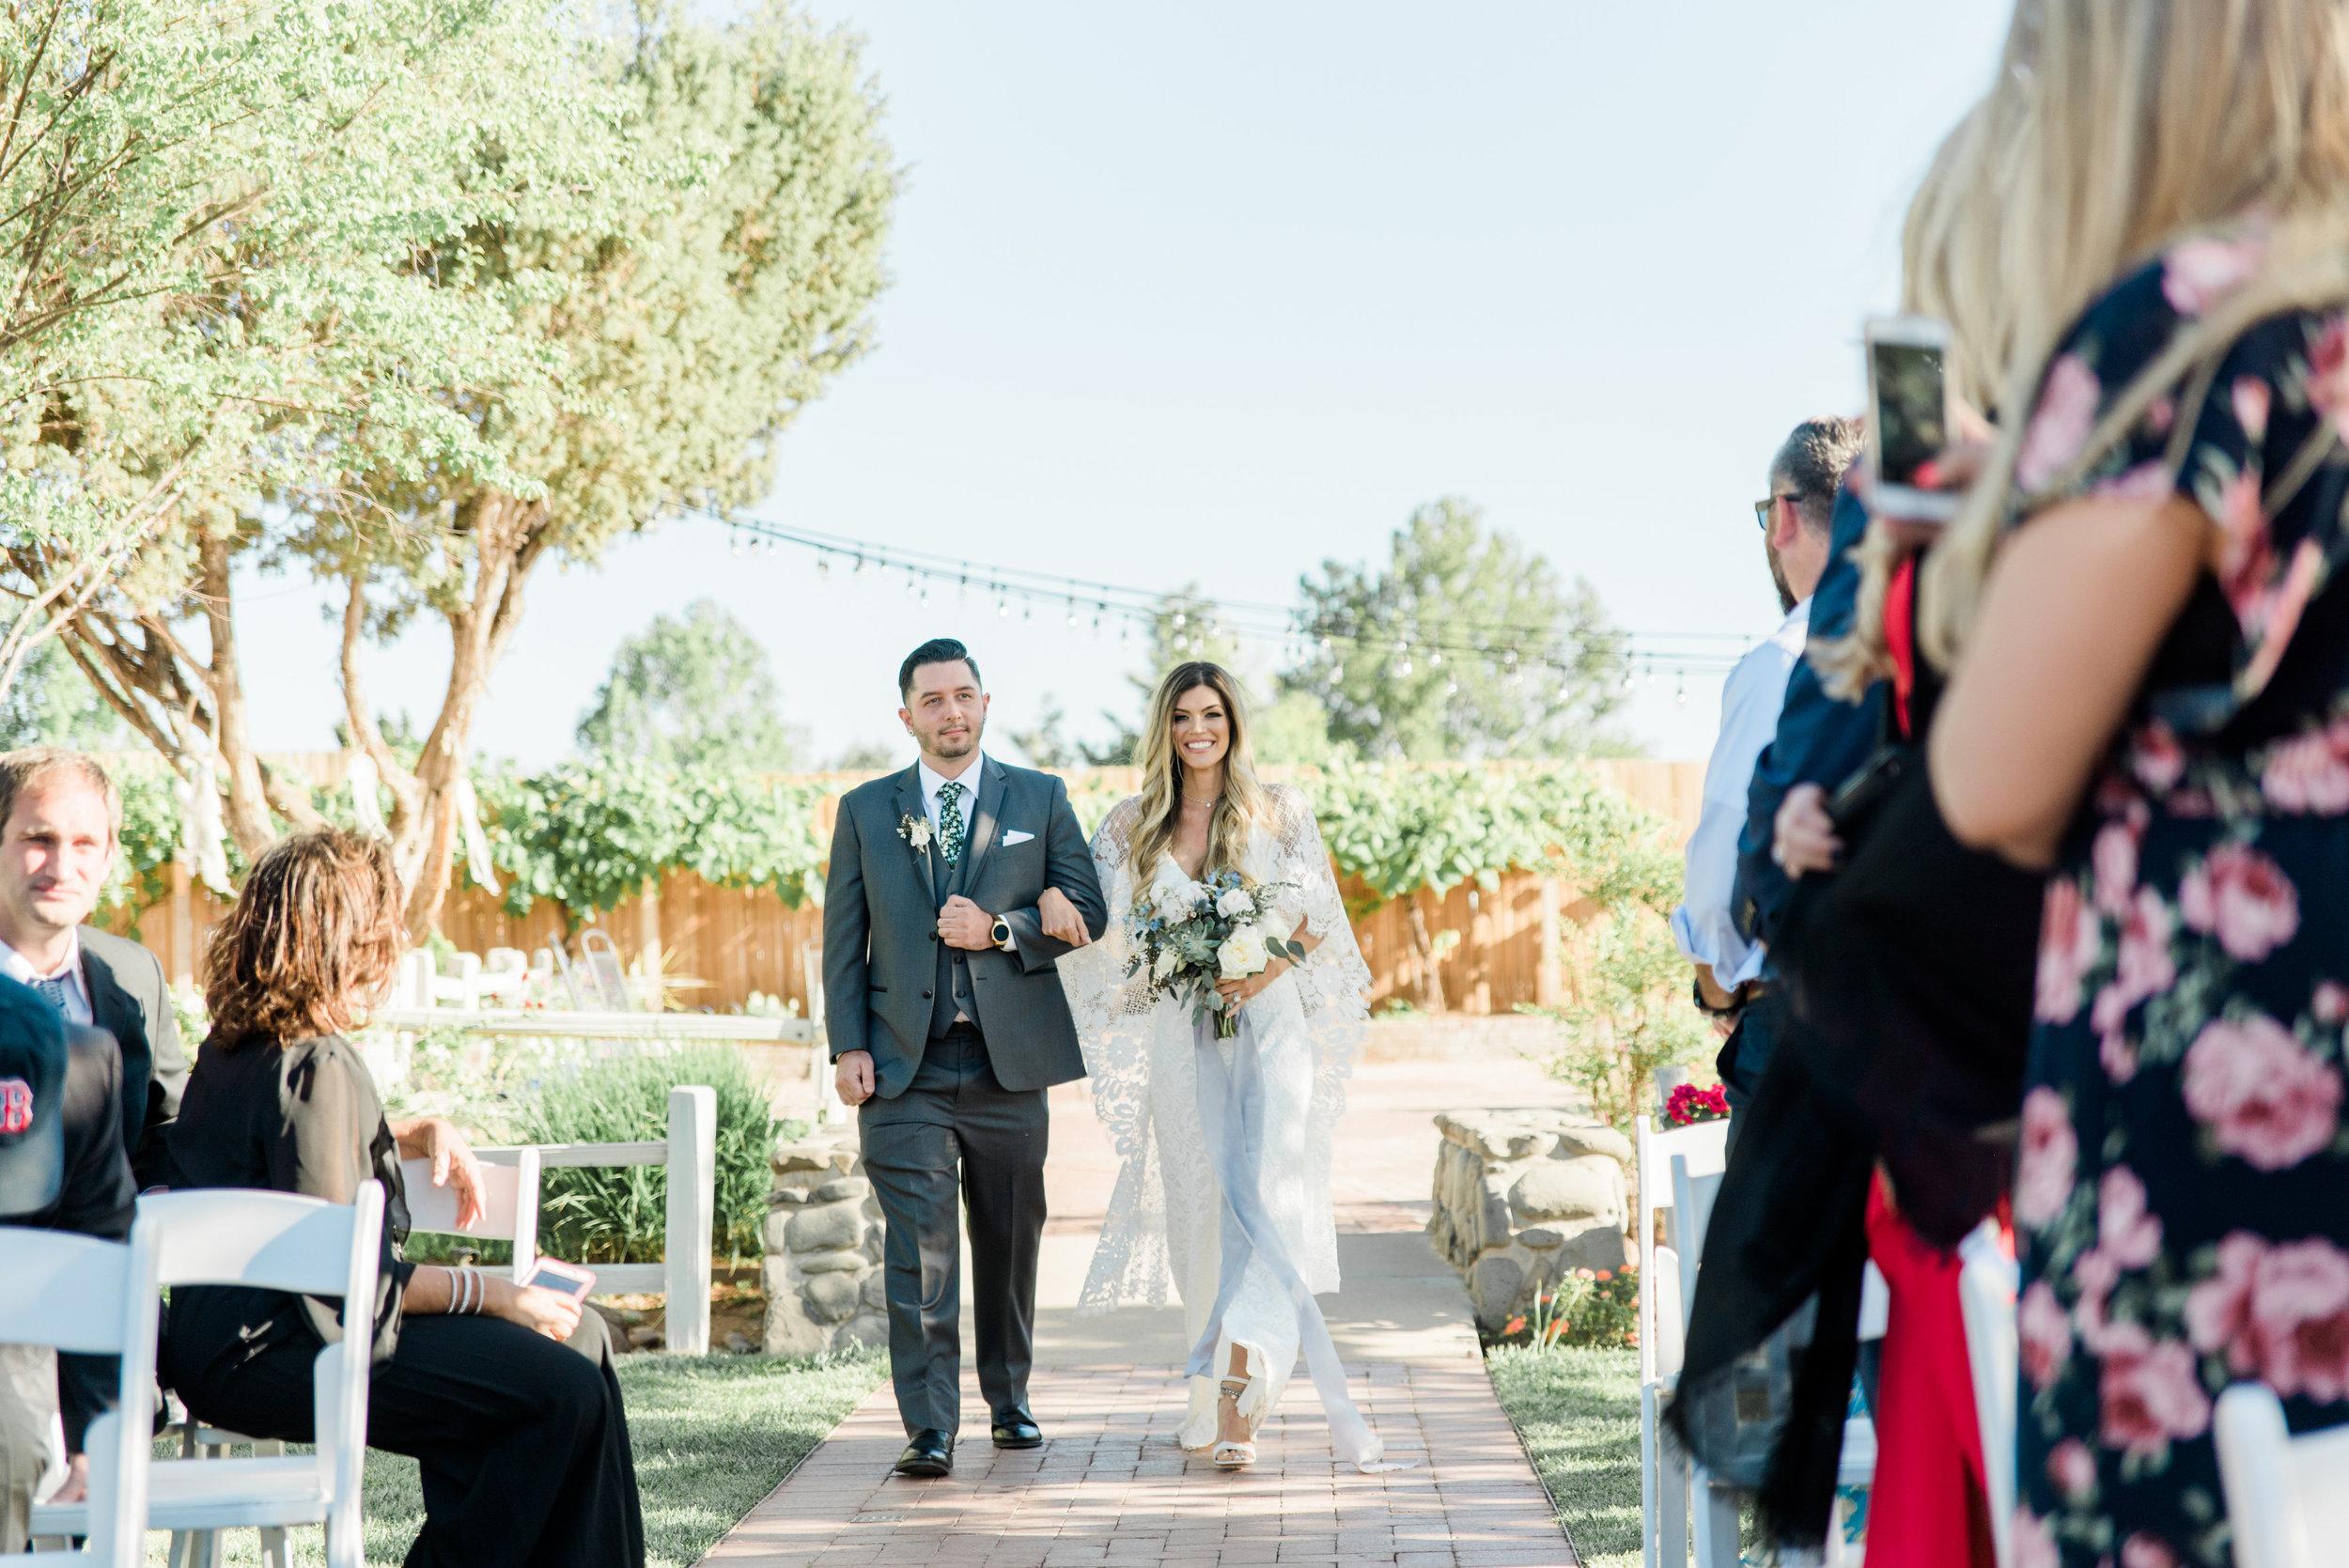 Boho Sedona Wedding - Walk down the aisle